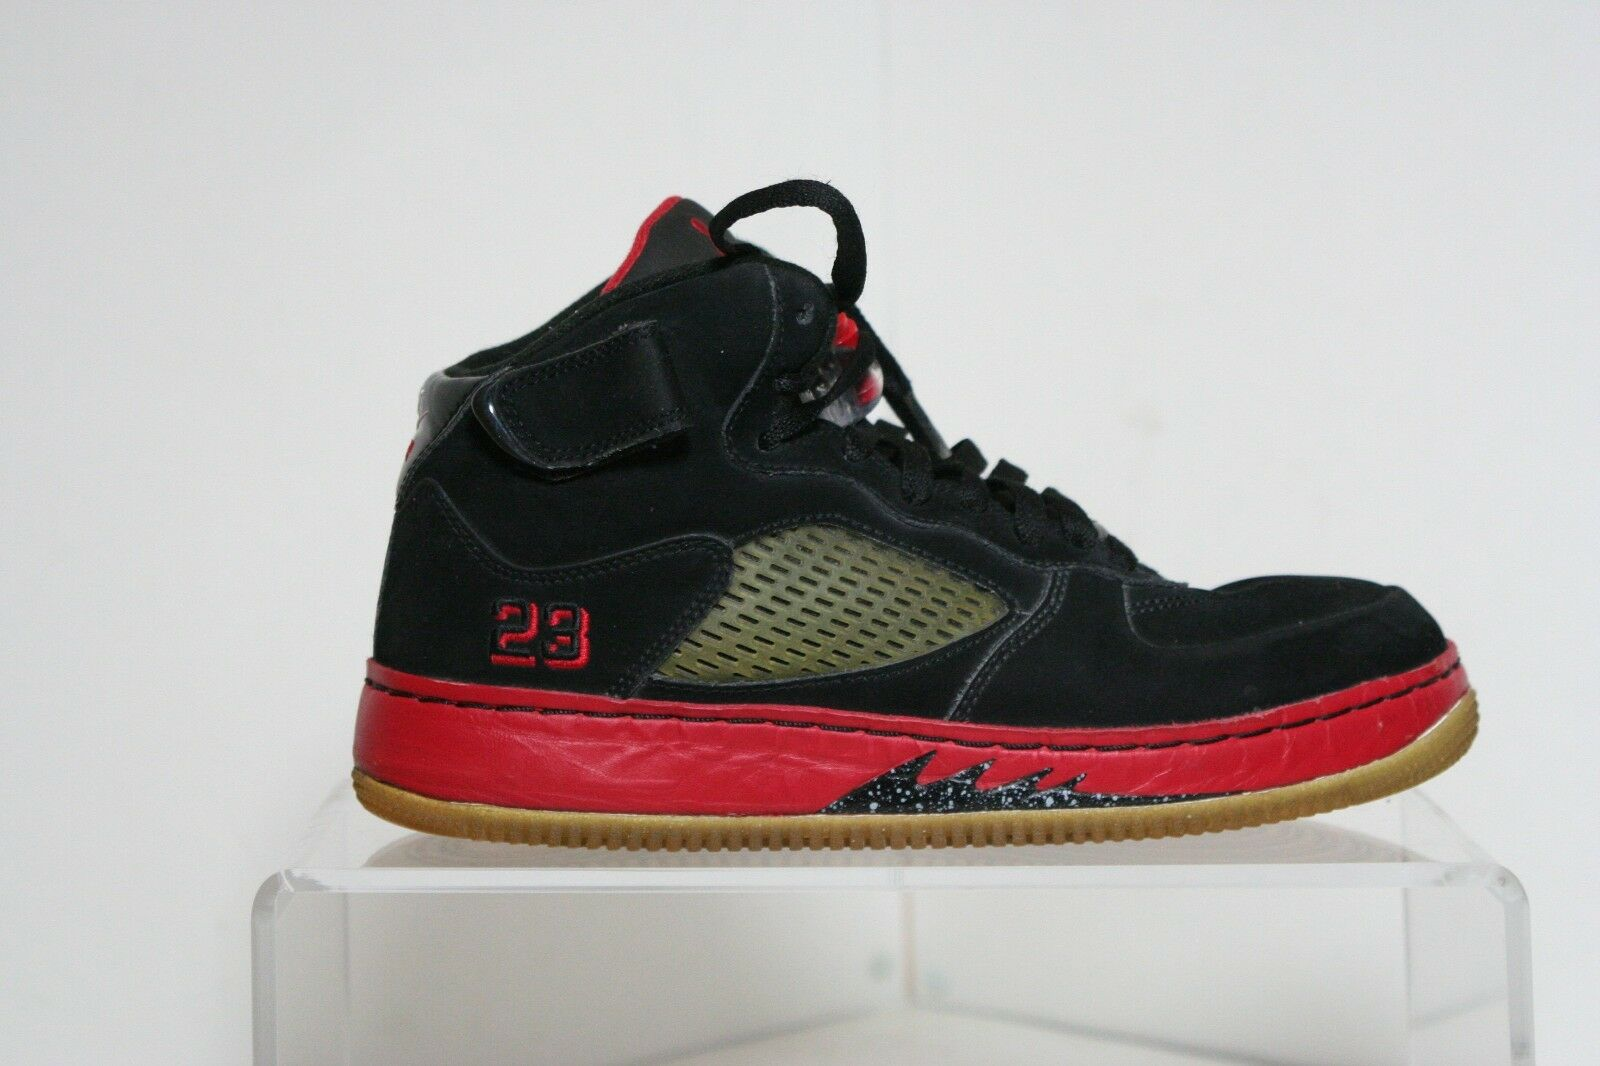 Nike Air Jordan Fusion V AJF 5 2007 Bred Men 8.5 Multi Bred 2007 Athletic Basketball Hip dfa7a6